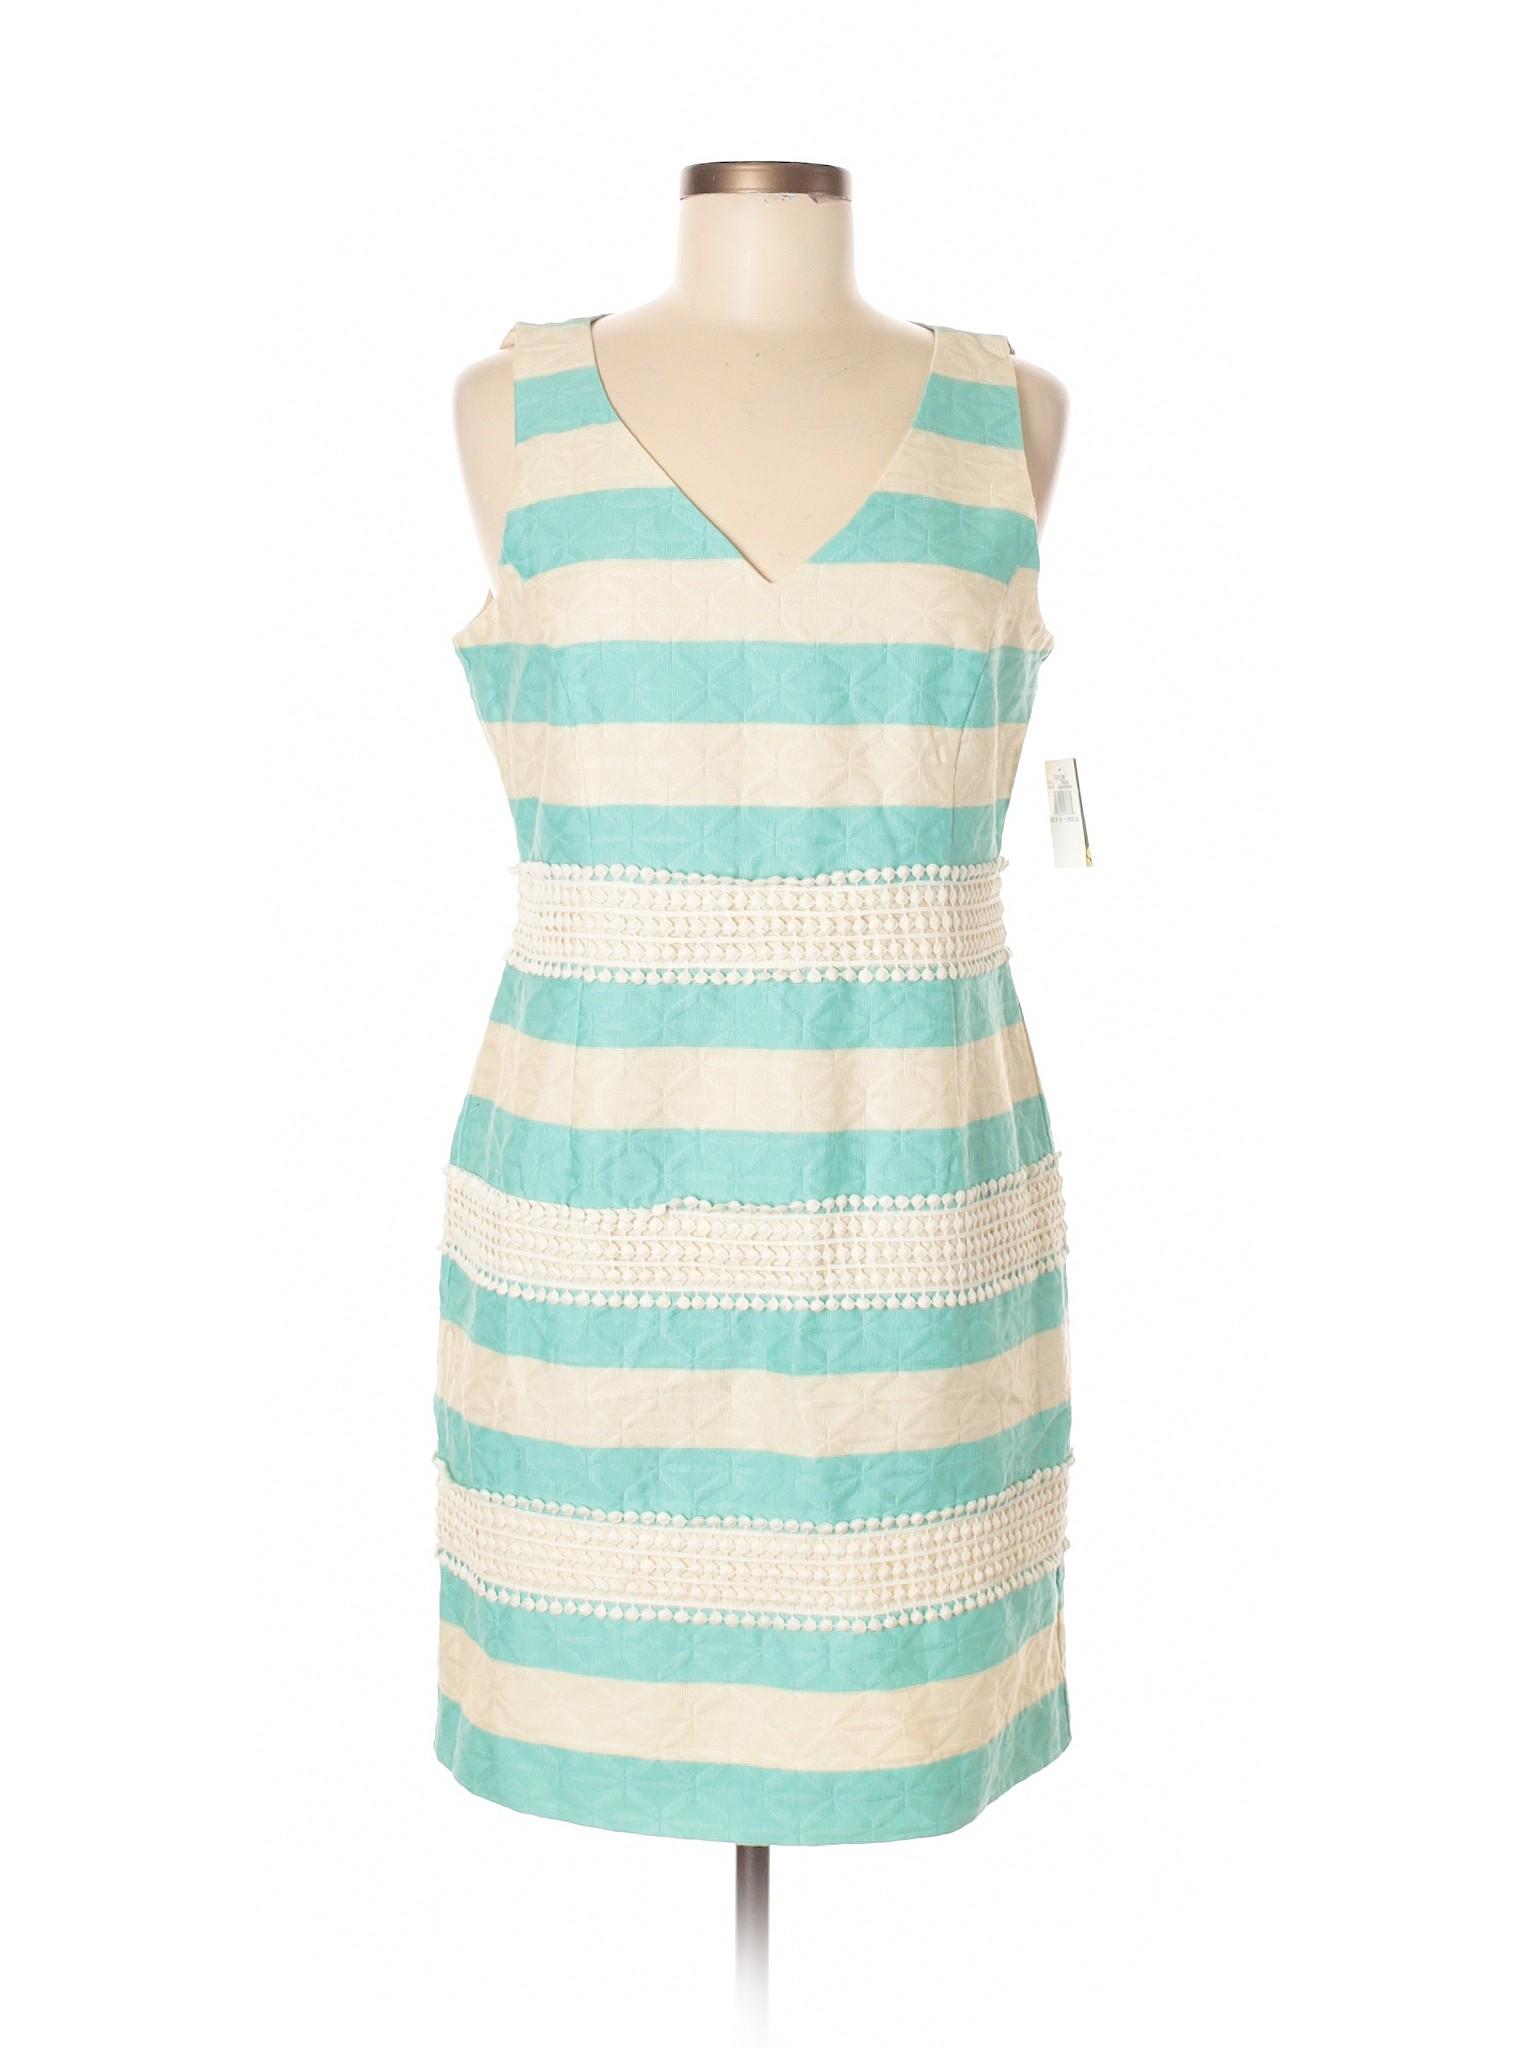 winter Taylor Dress Dress Boutique Casual Taylor winter Boutique Casual fwRq6TaXx